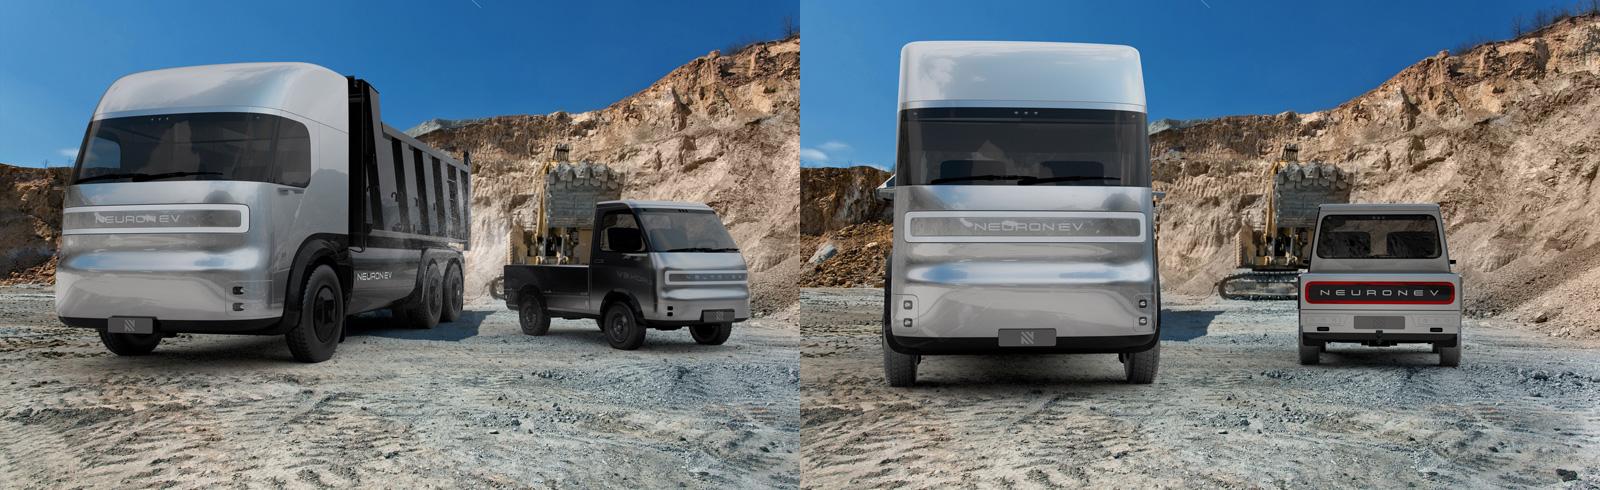 Neuron EV unveils a duo of modular electric trucks